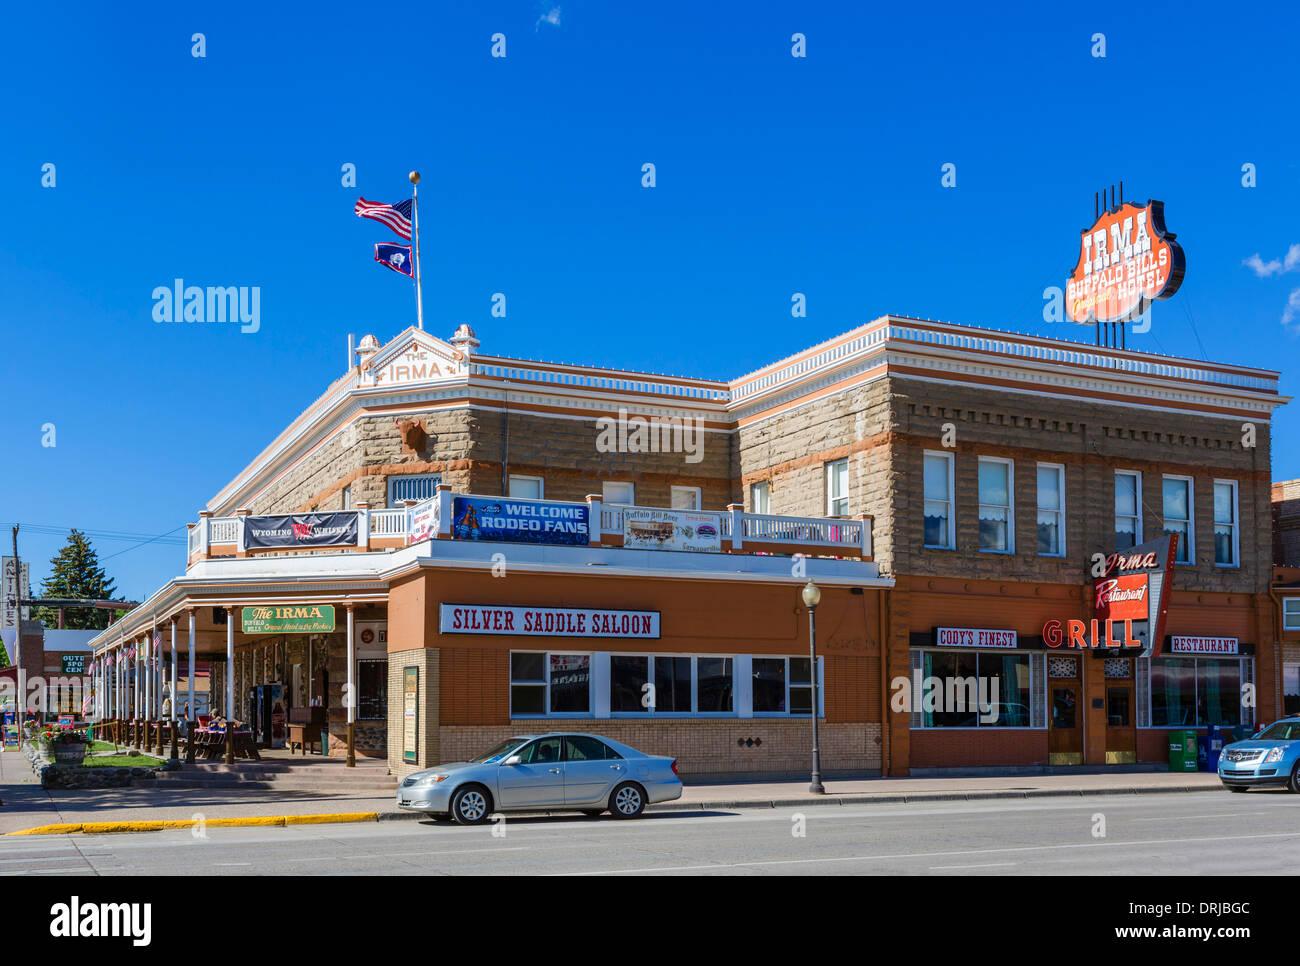 Buffalo Bill Irma Hotel, Sheridan Avenue in der Innenstadt von Cody, Wyoming, USA Stockbild